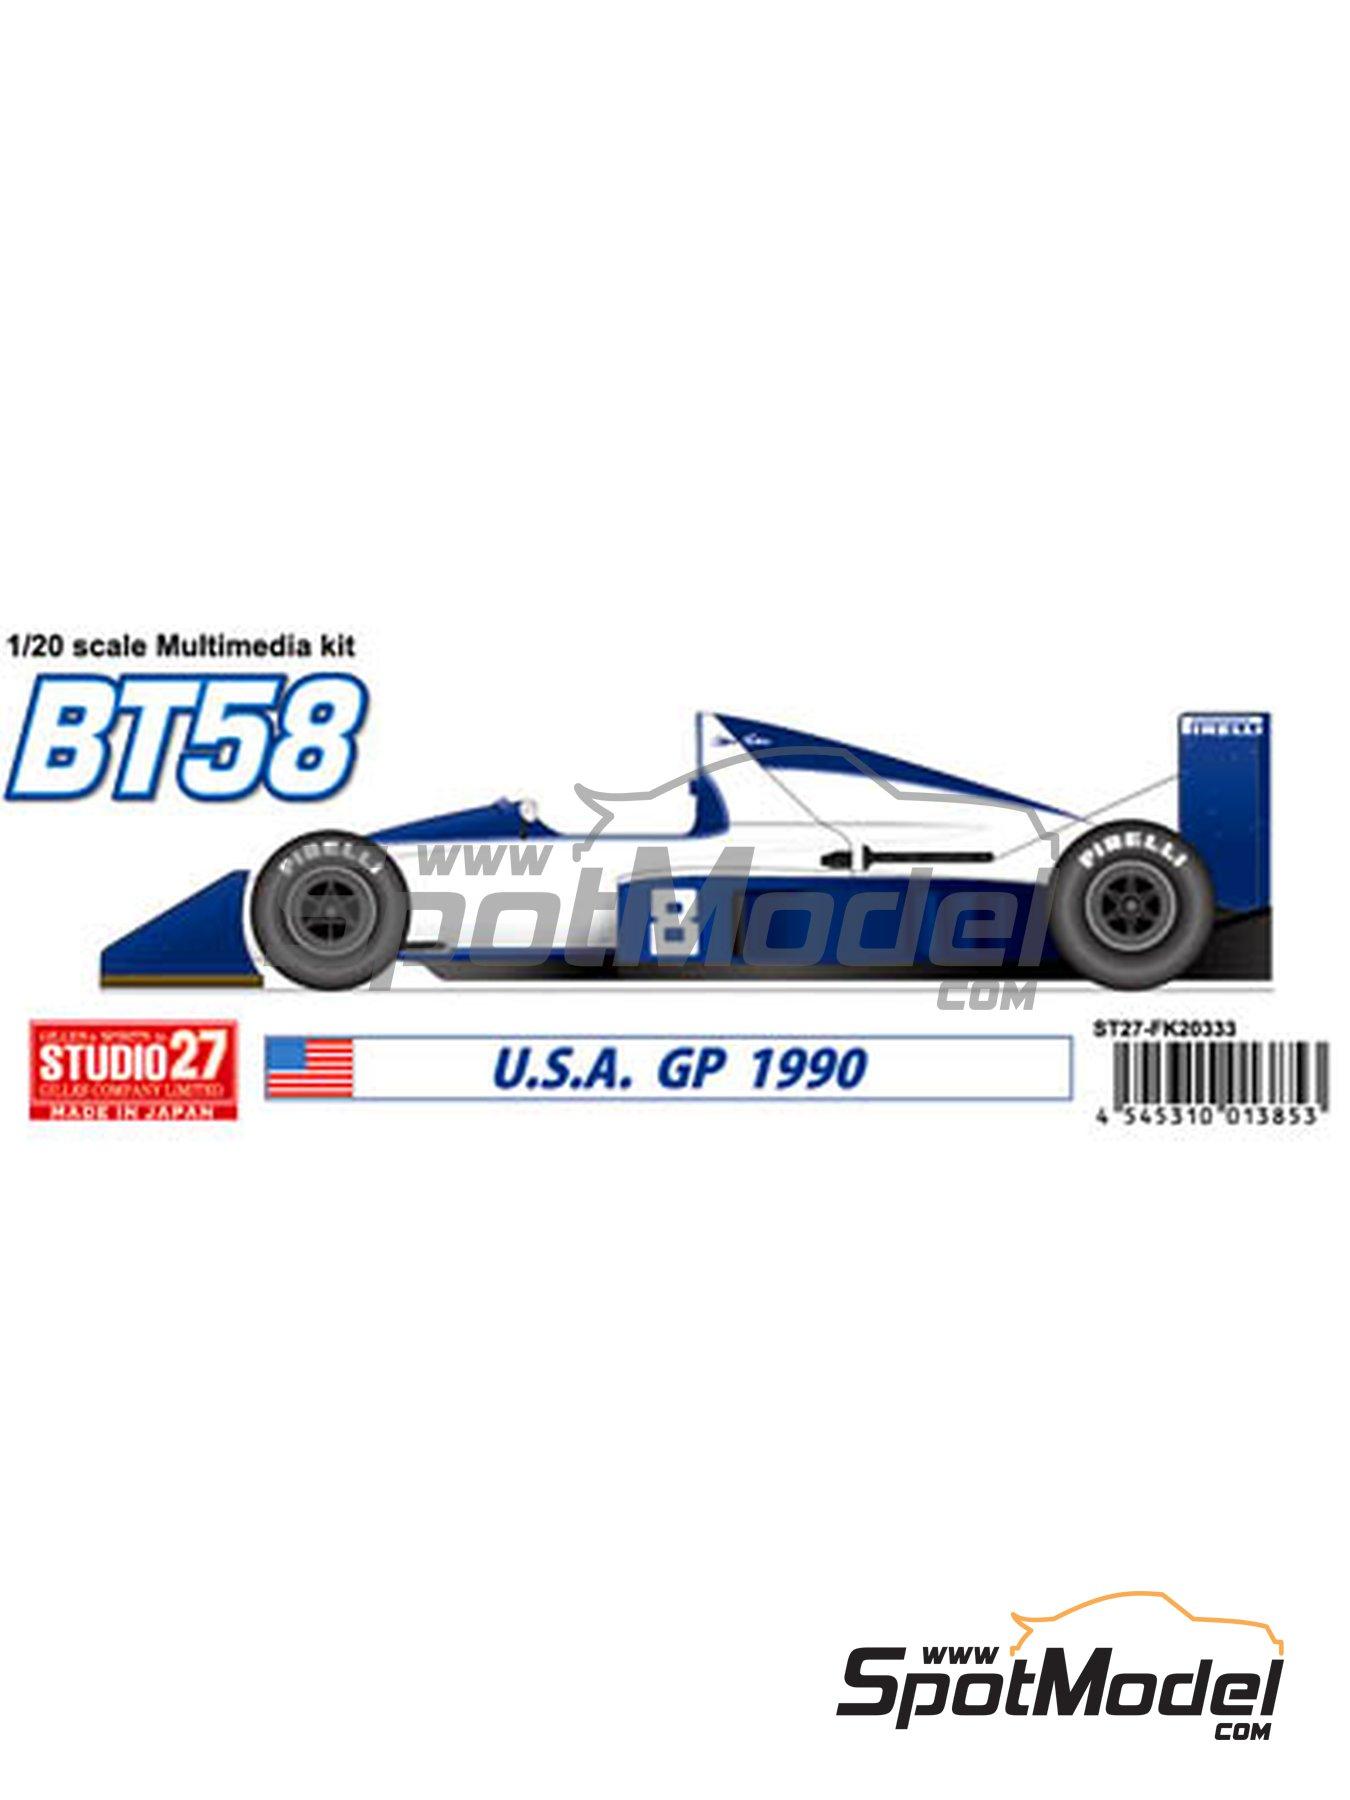 Brabham Judd BT58 - USA Formula 1 Grand Prix 1990 | Model car kit in 1/20 scale manufactured by Studio27 (ref.ST27-FK20333) image